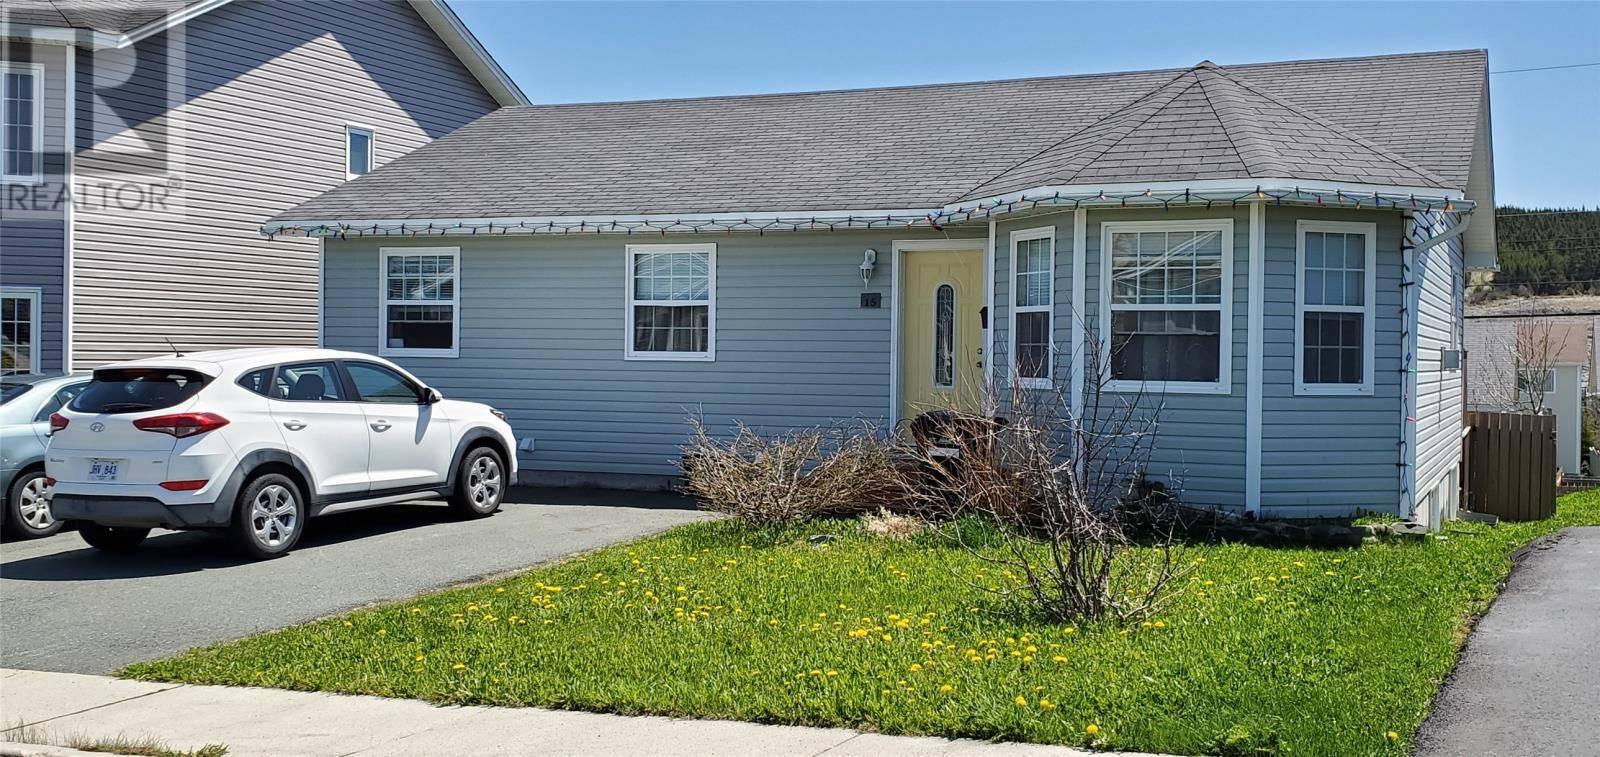 House for sale at 15 Northern Ranger St St. John's Newfoundland - MLS: 1211997